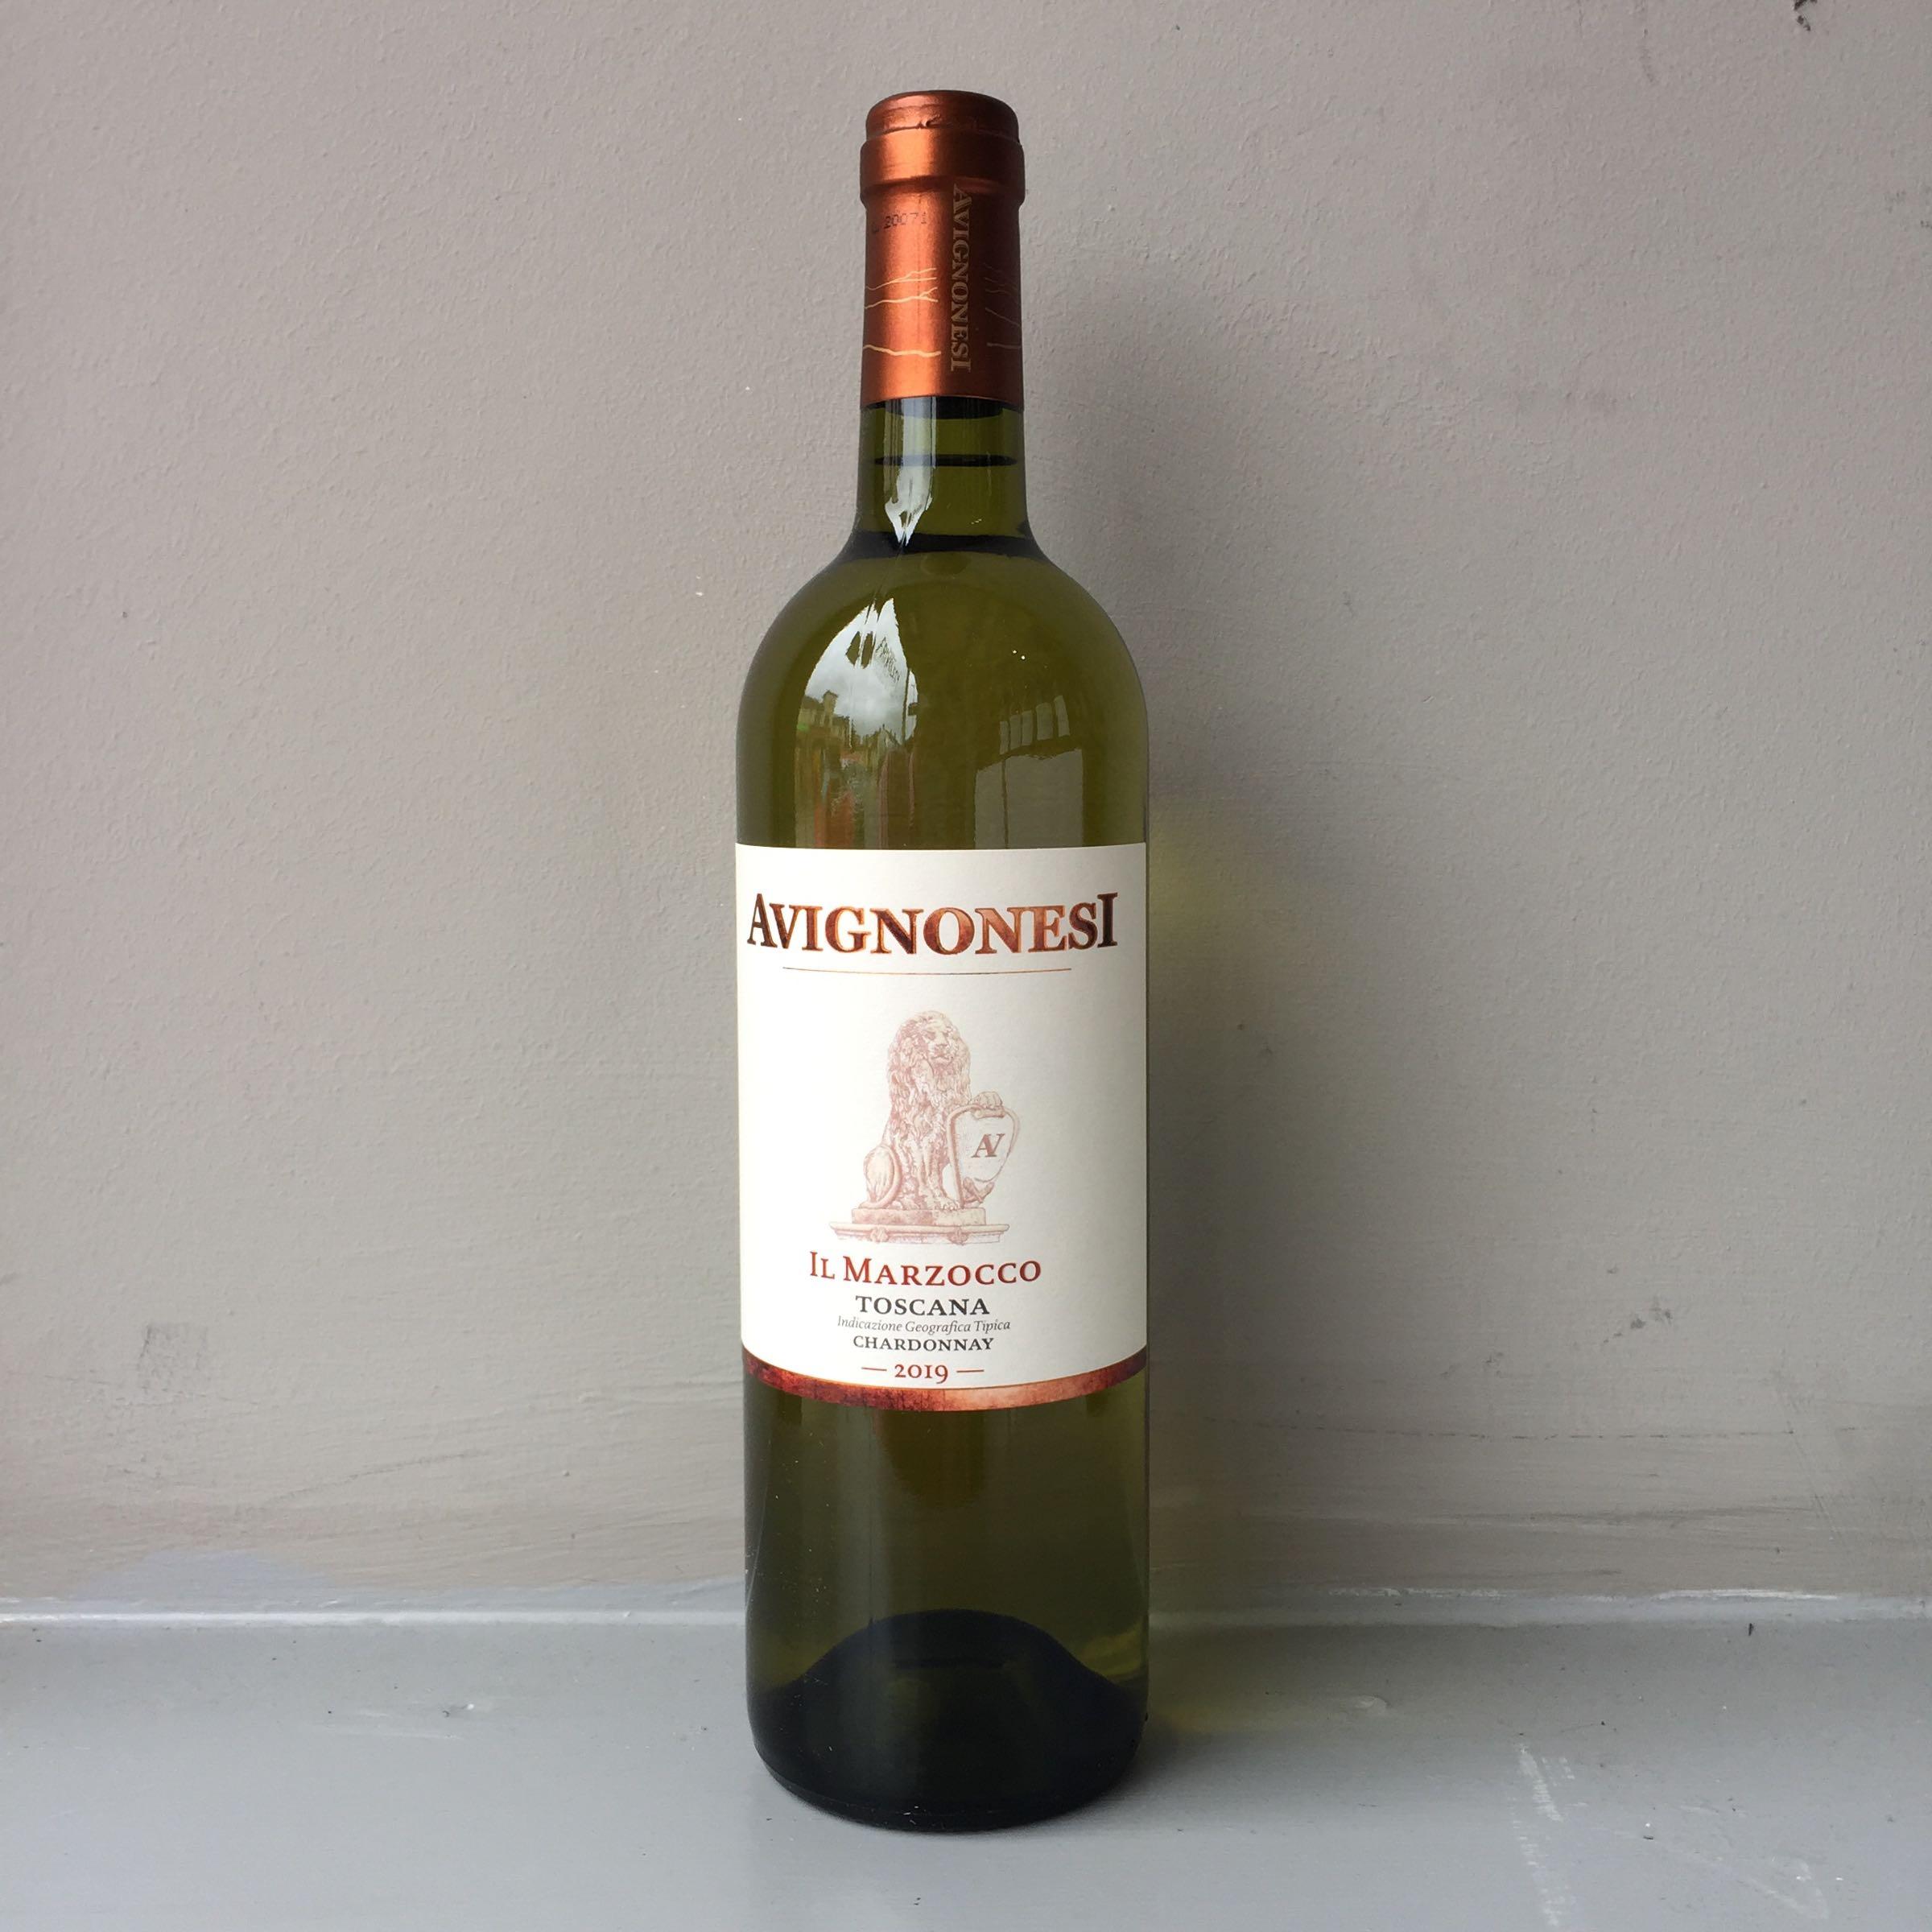 Avignonesi 'Il Marzocco' Chardonnay Toscana